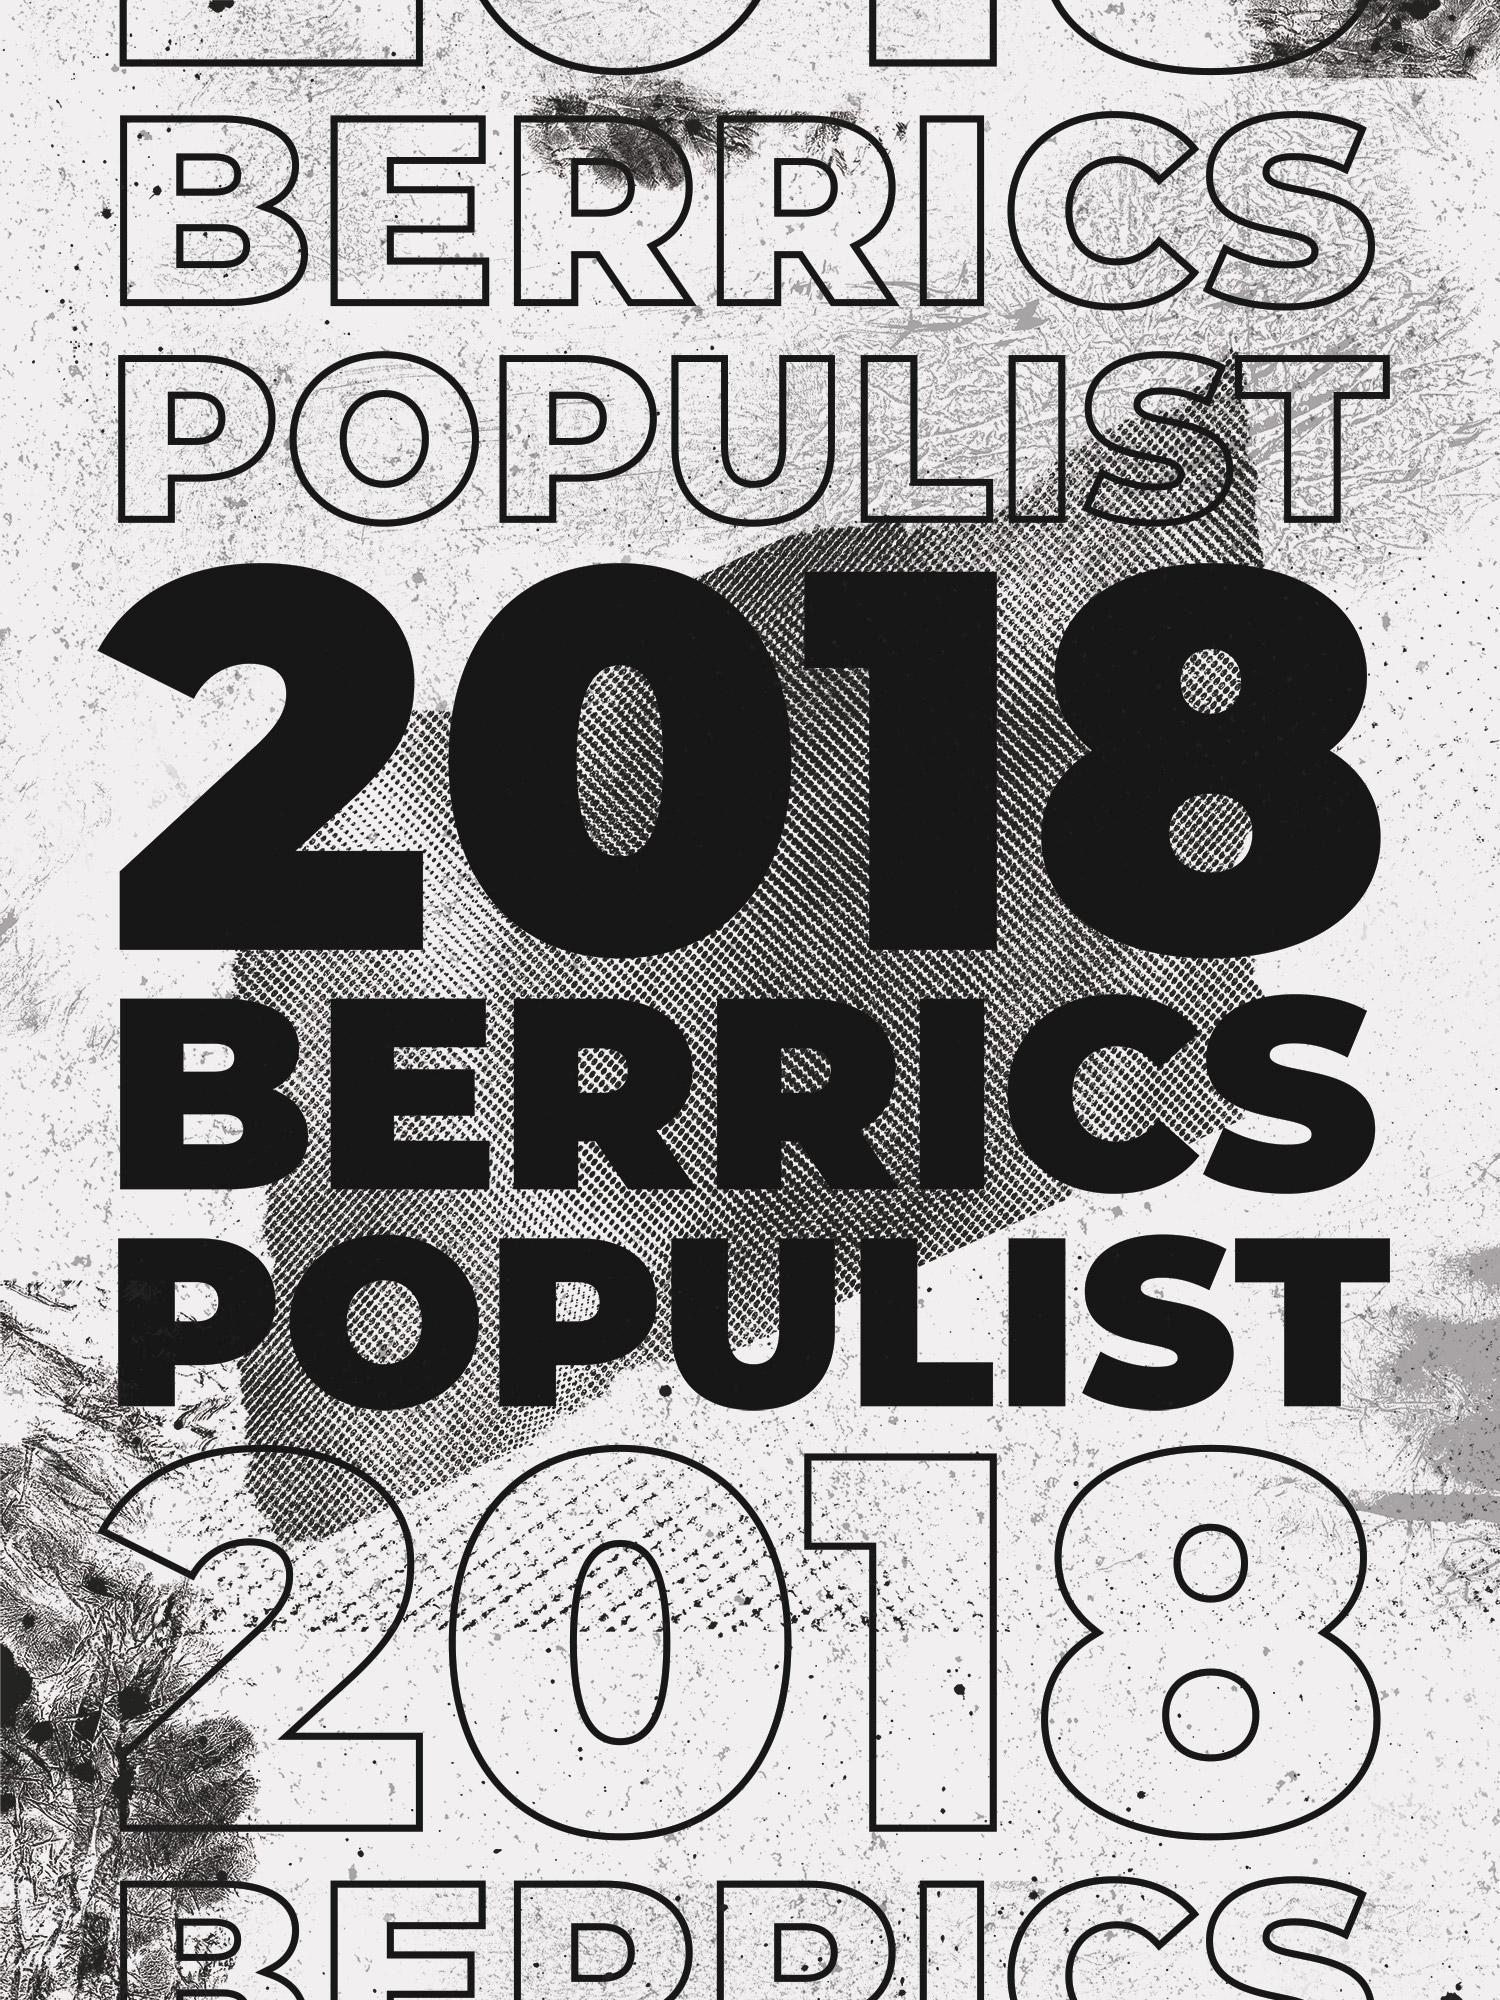 Joslin_2_Berrics_Populist_Poster.jpg